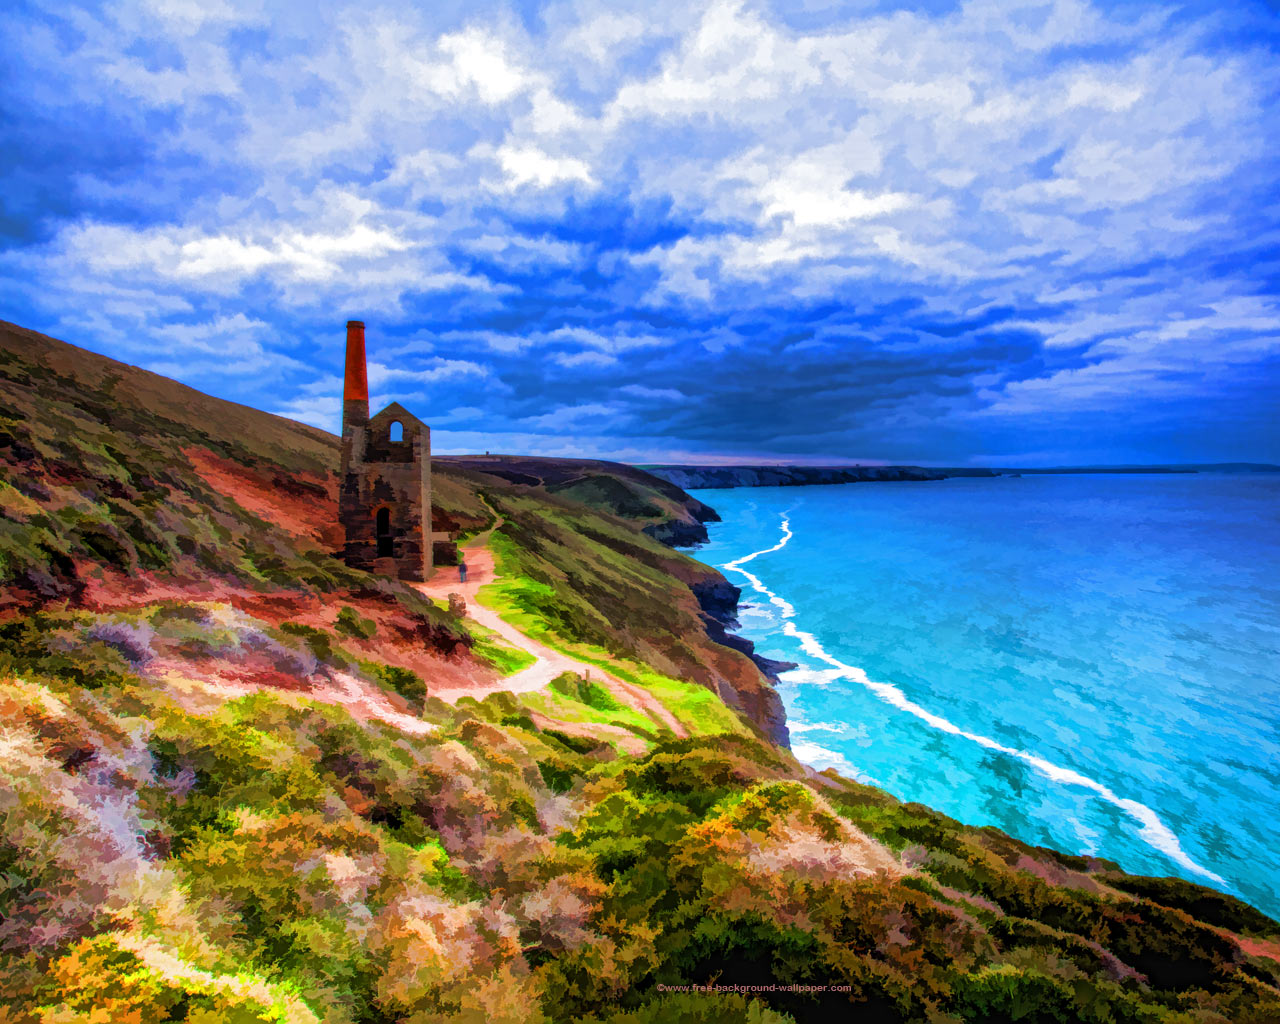 Desktop Background Cornwall 1093609   HD Wallpaper Download 1280x1024